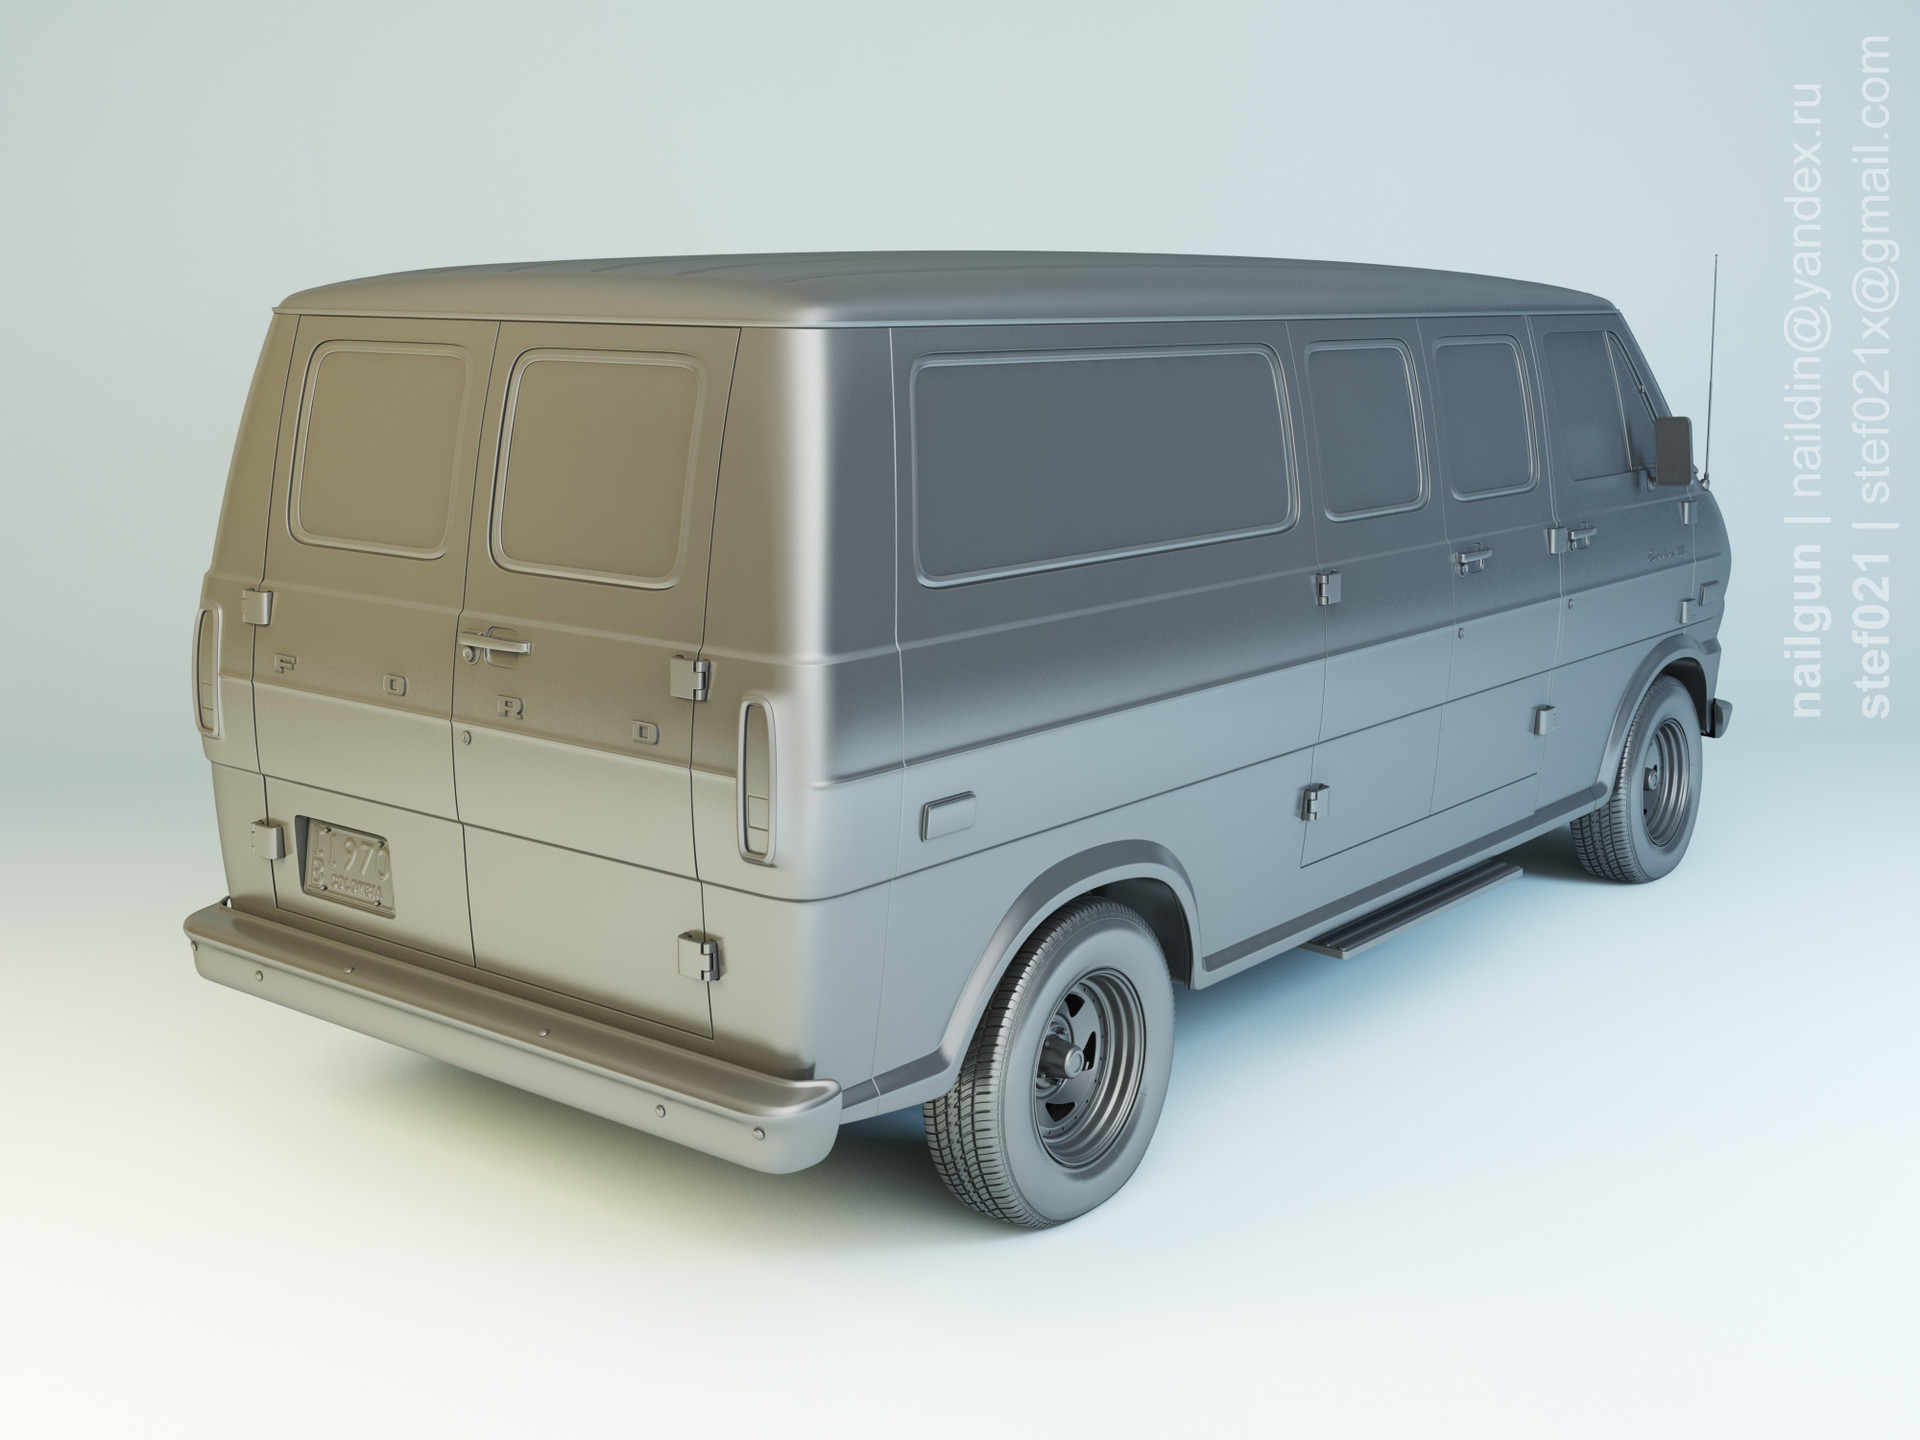 Nail khusnutdinov pwc 069 000 ford econoline modelling 1